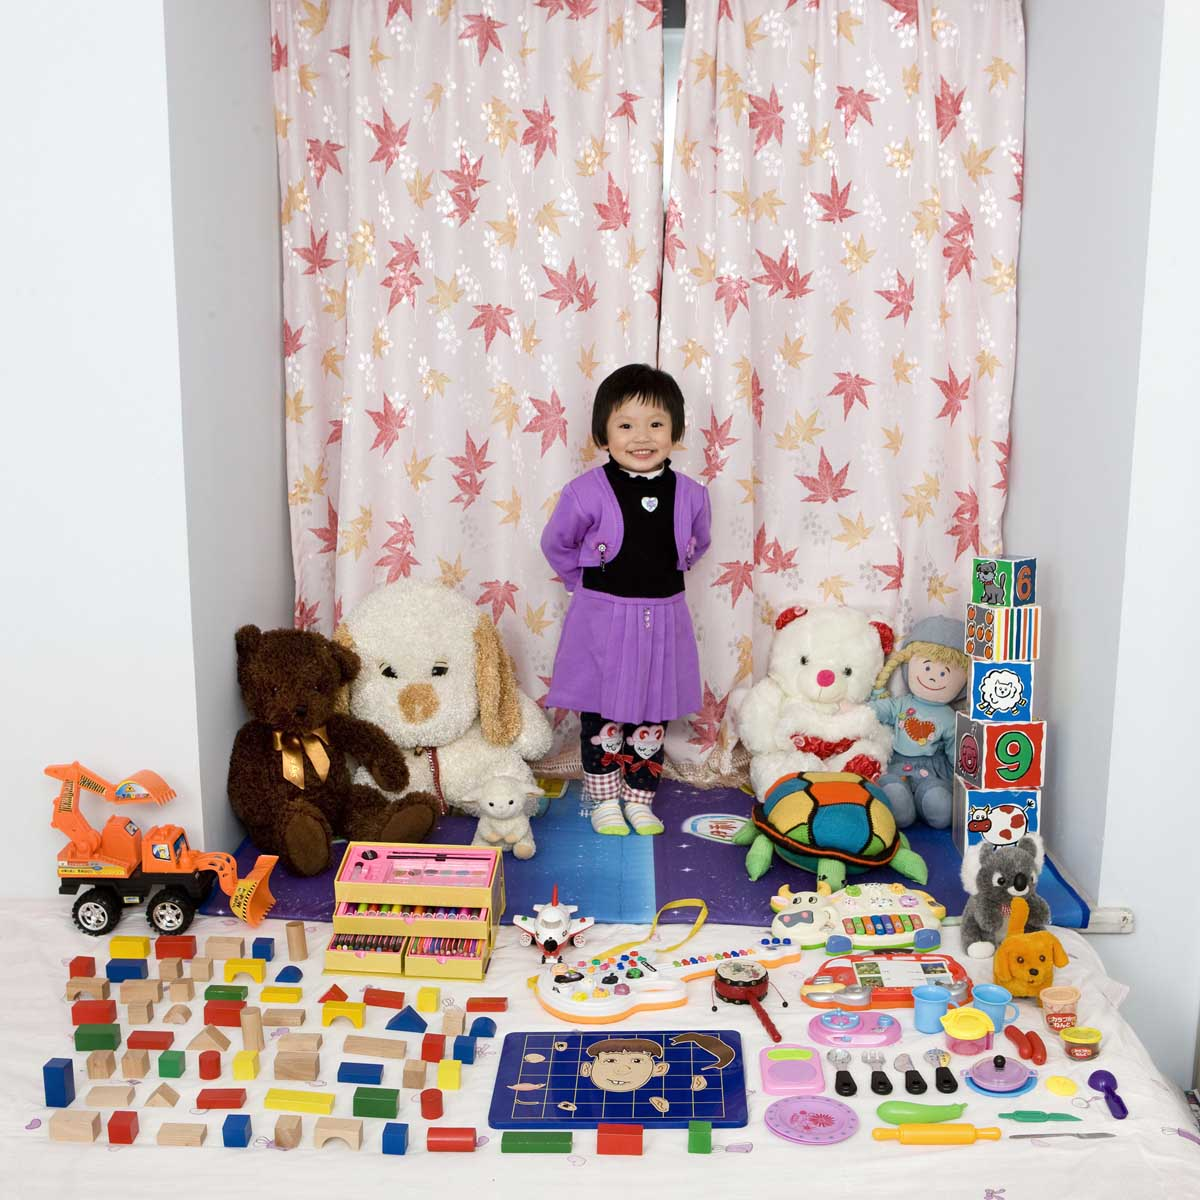 Chongqing, China, Asia, life, kid, kids